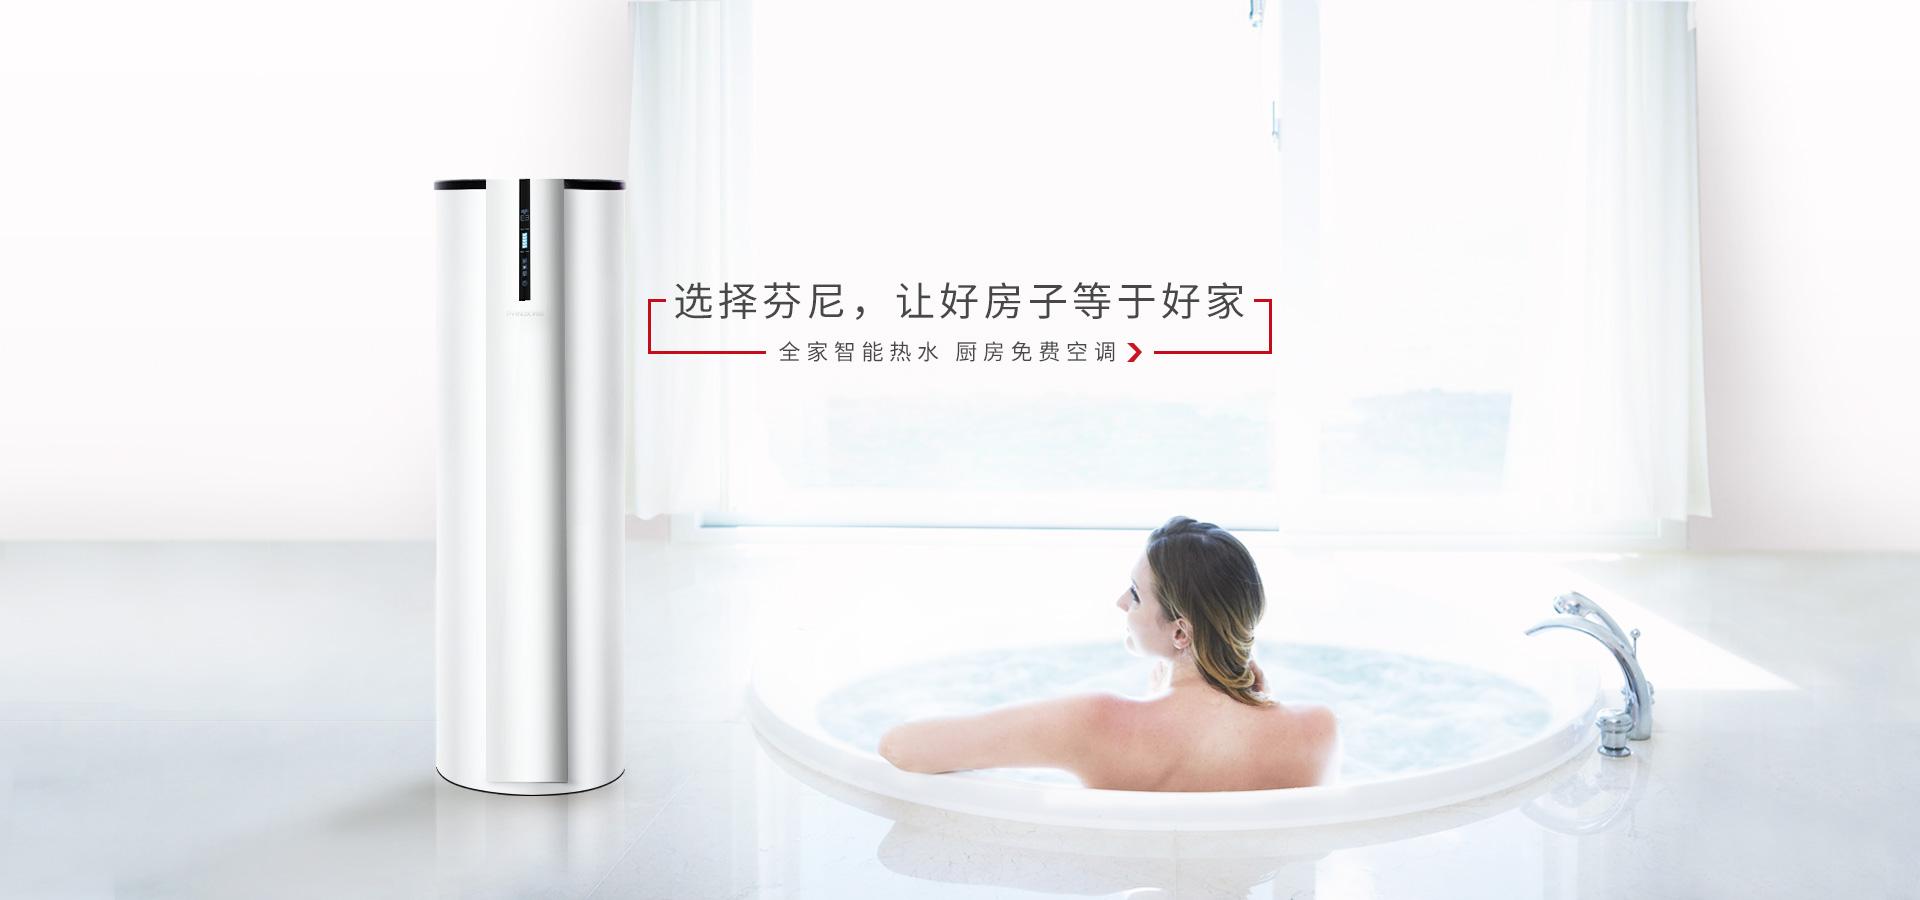 ysb288易胜博官网空气能热水器_全屋热水器解决方案